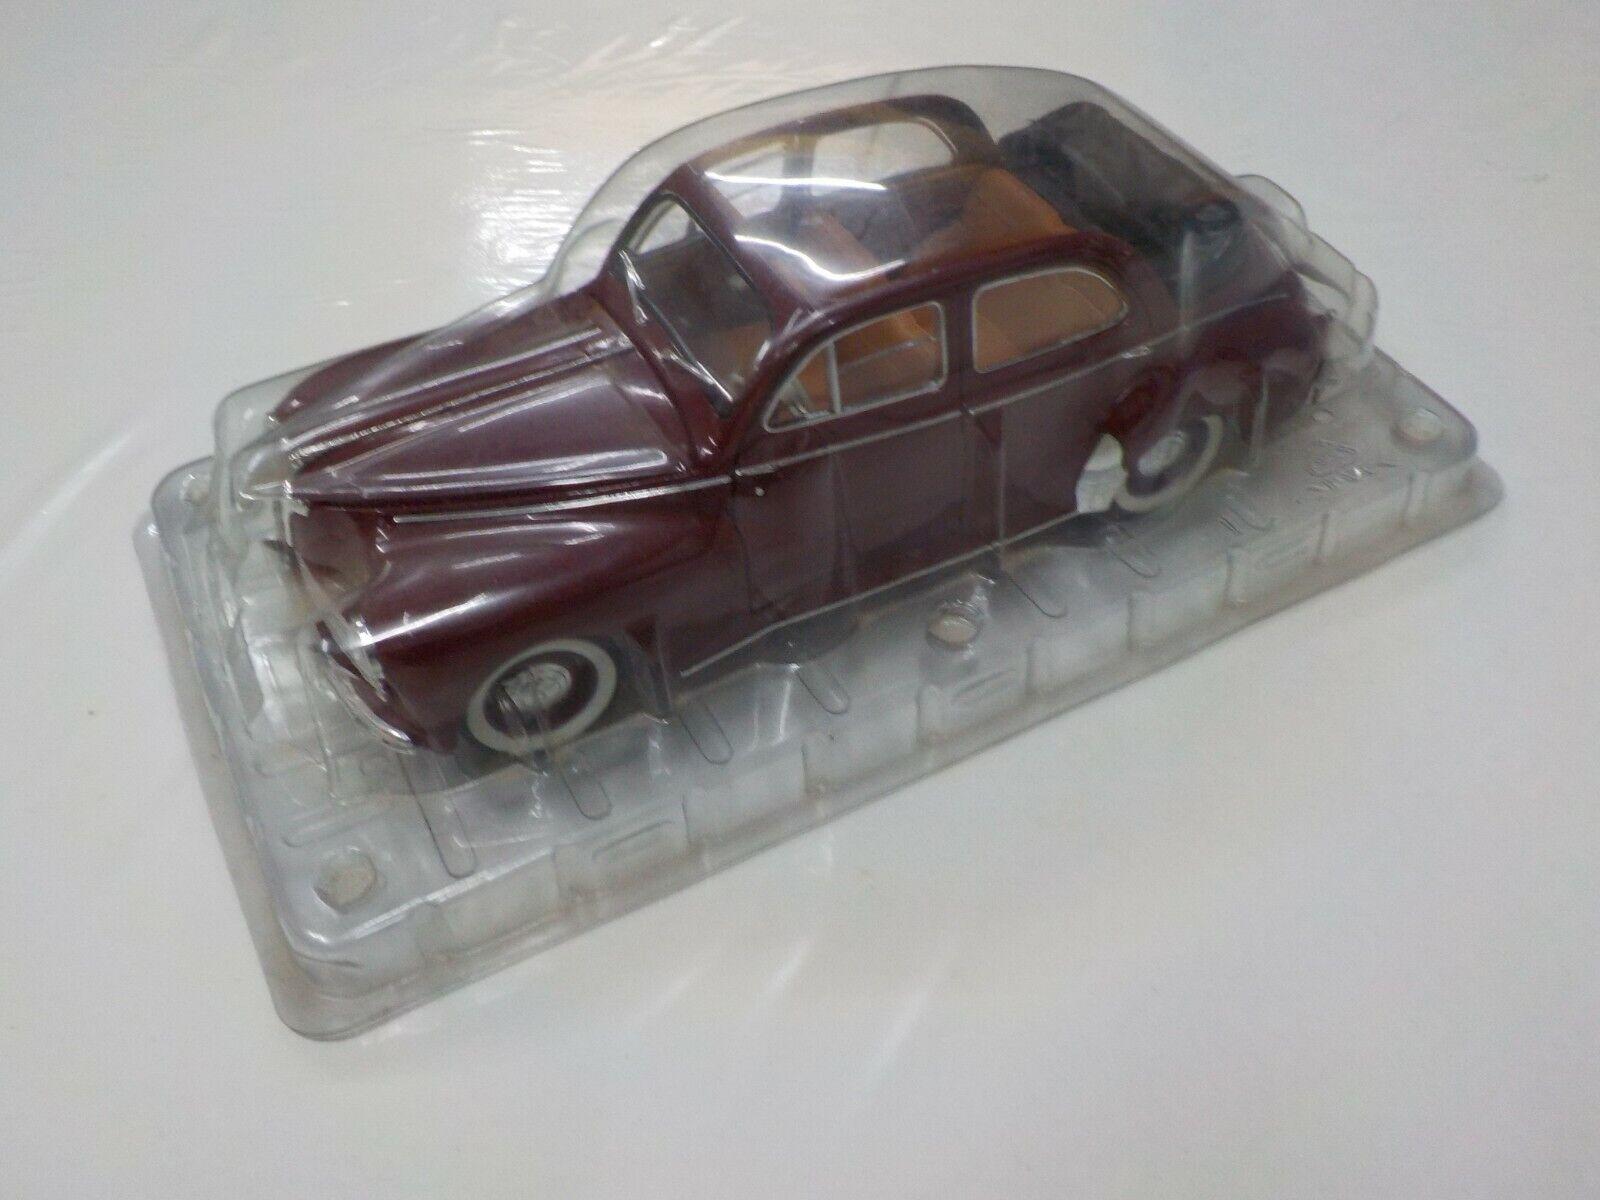 Peugeot 203 Cabriolet - 1954 - Solido - Scala 1 18 - COMPRO FUMETTI SHOP